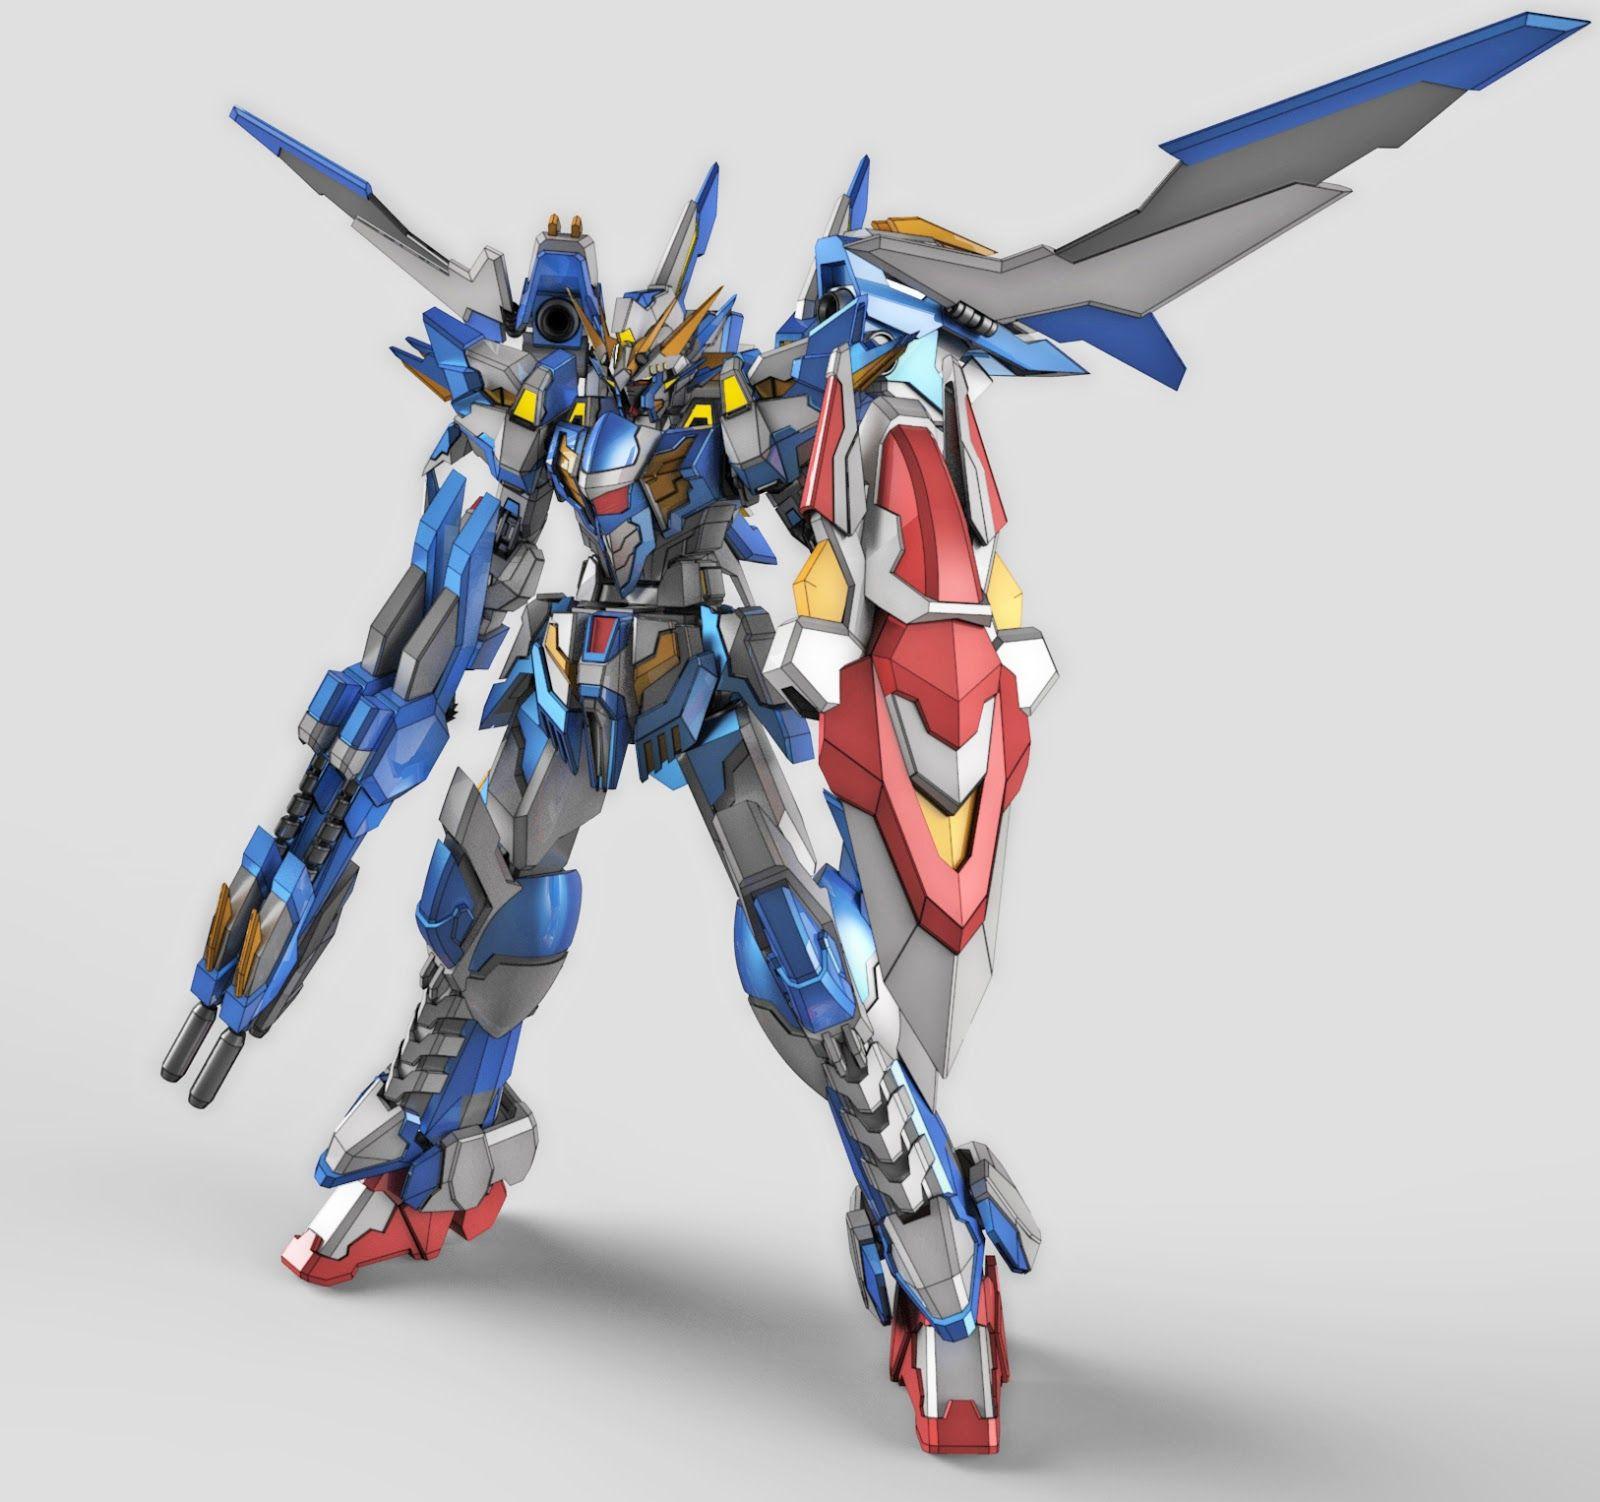 Awesome Gundam Digital Artworks [Updated 8/7/16] Gundam